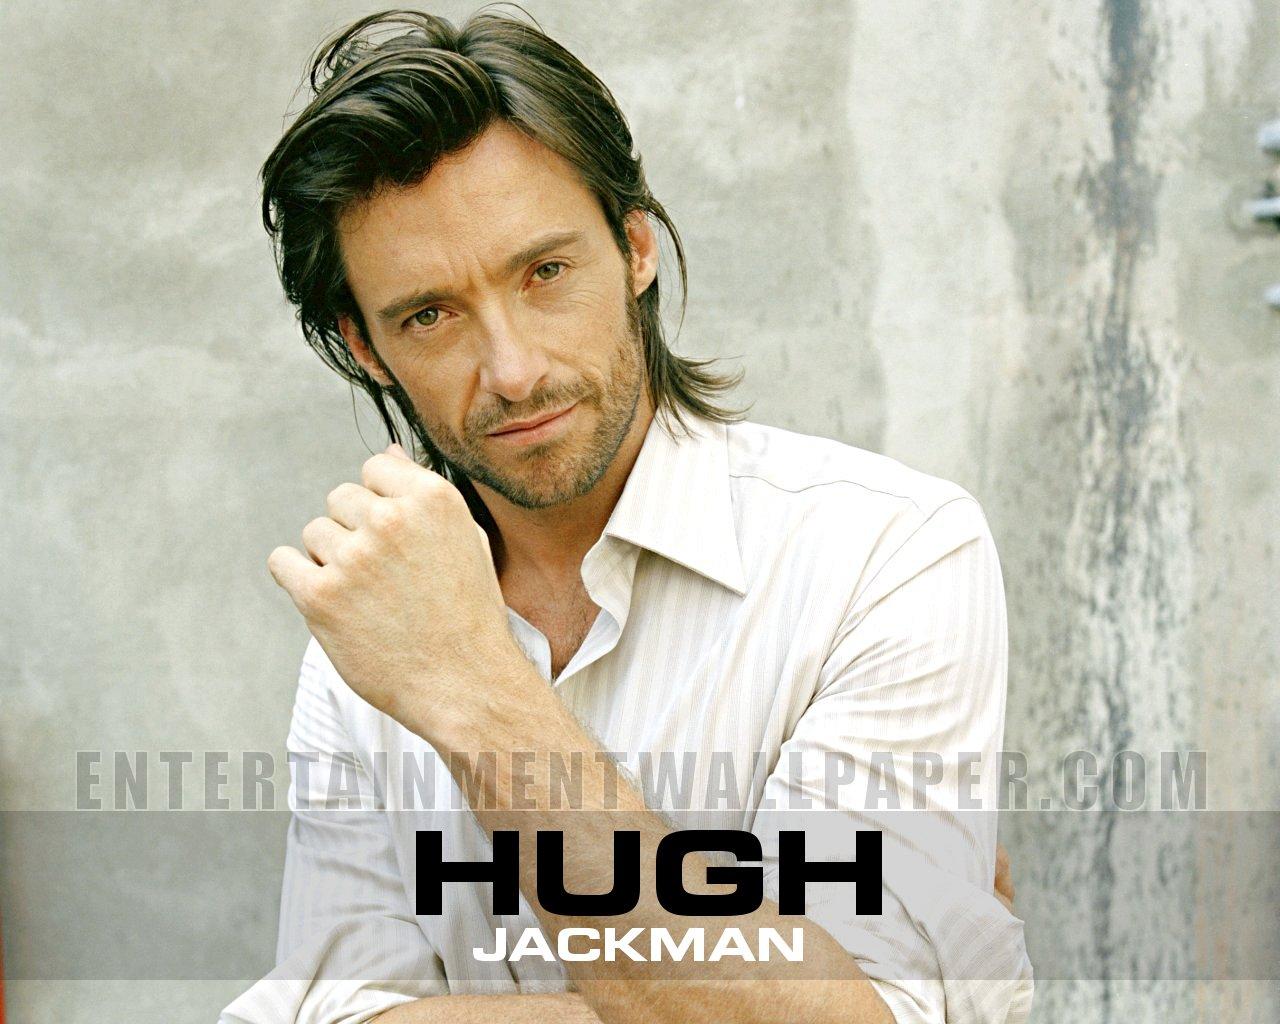 hugh jack - hugh-jackman Wallpaper